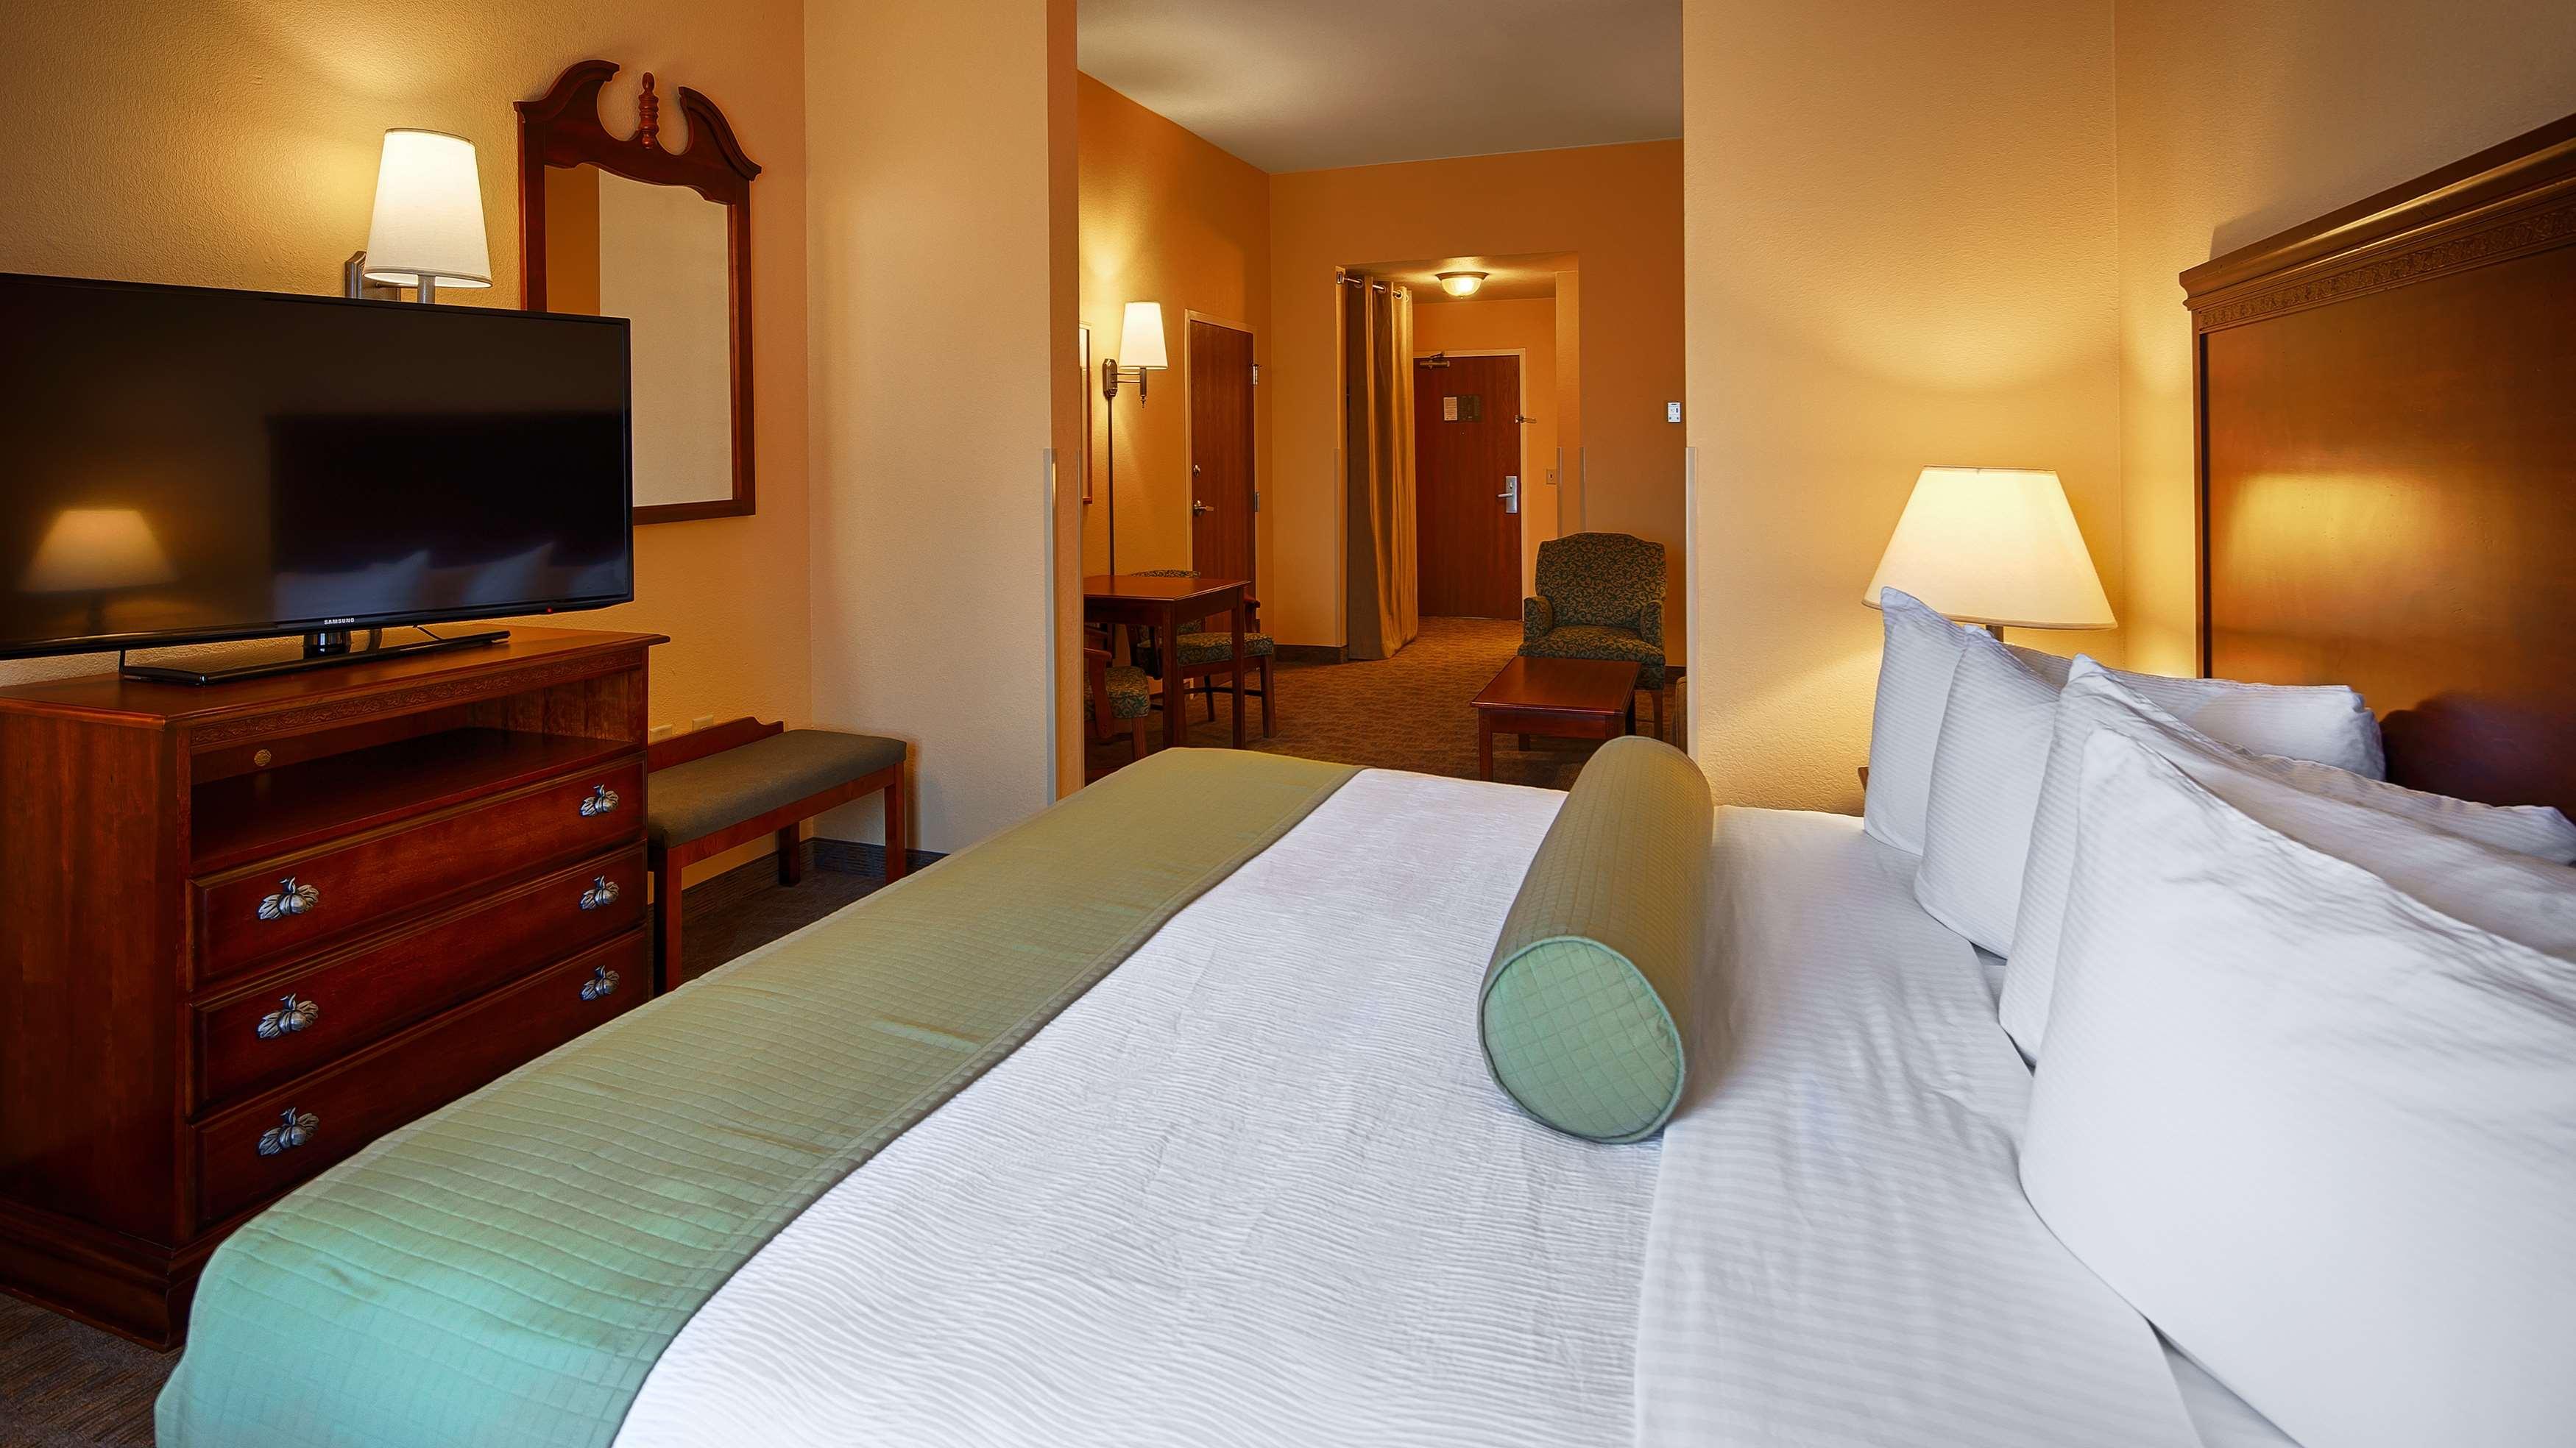 Best Western Plus Executive Hotel & Suites image 23